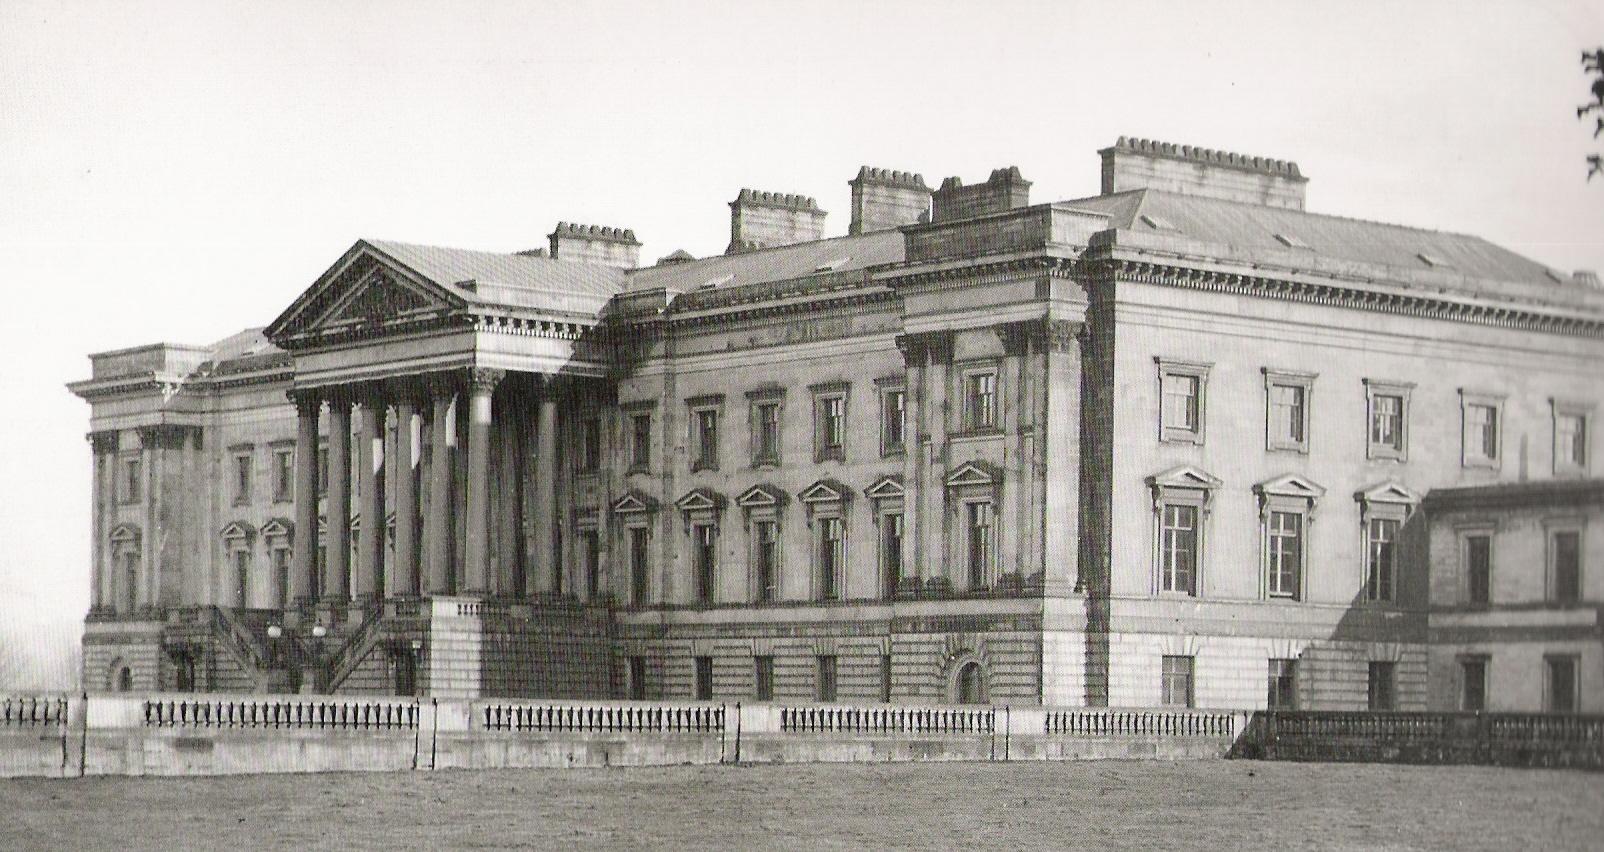 Opinions On Hamilton Palace film